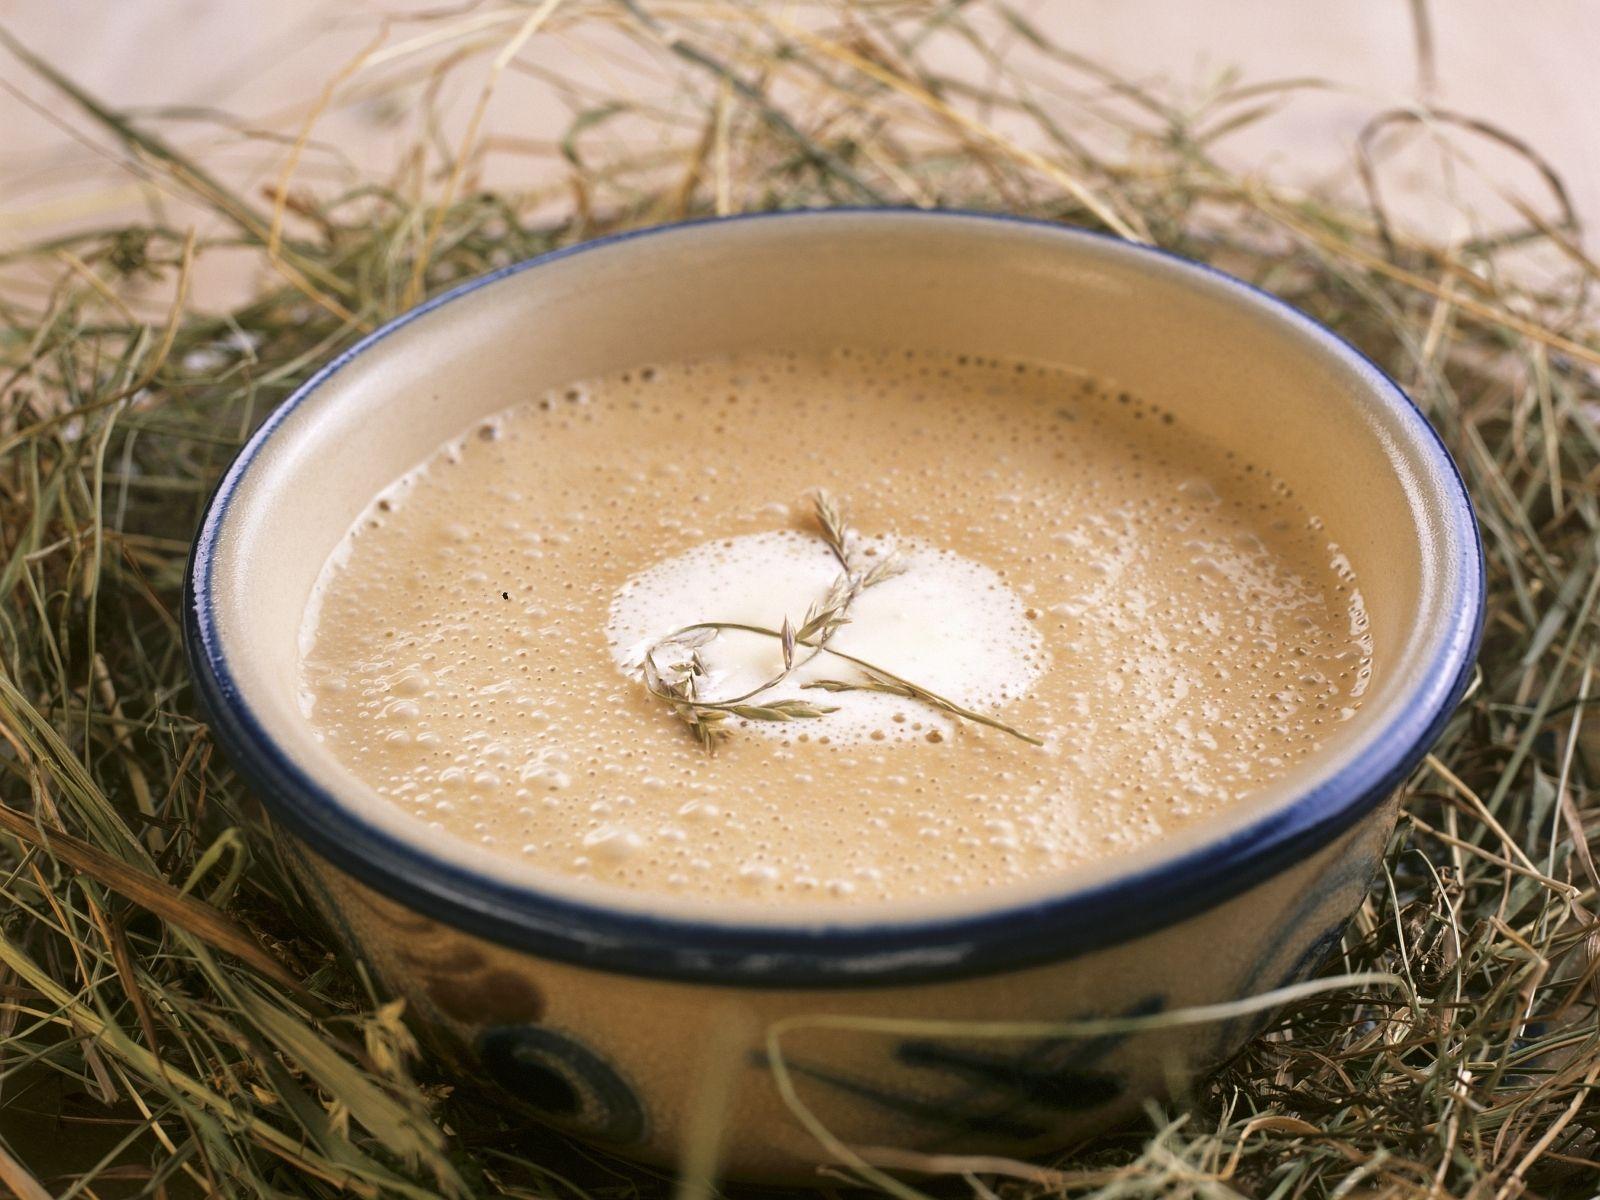 Heusuppe auf Engadiner Art (Schweiz) Rezept | EAT SMARTER